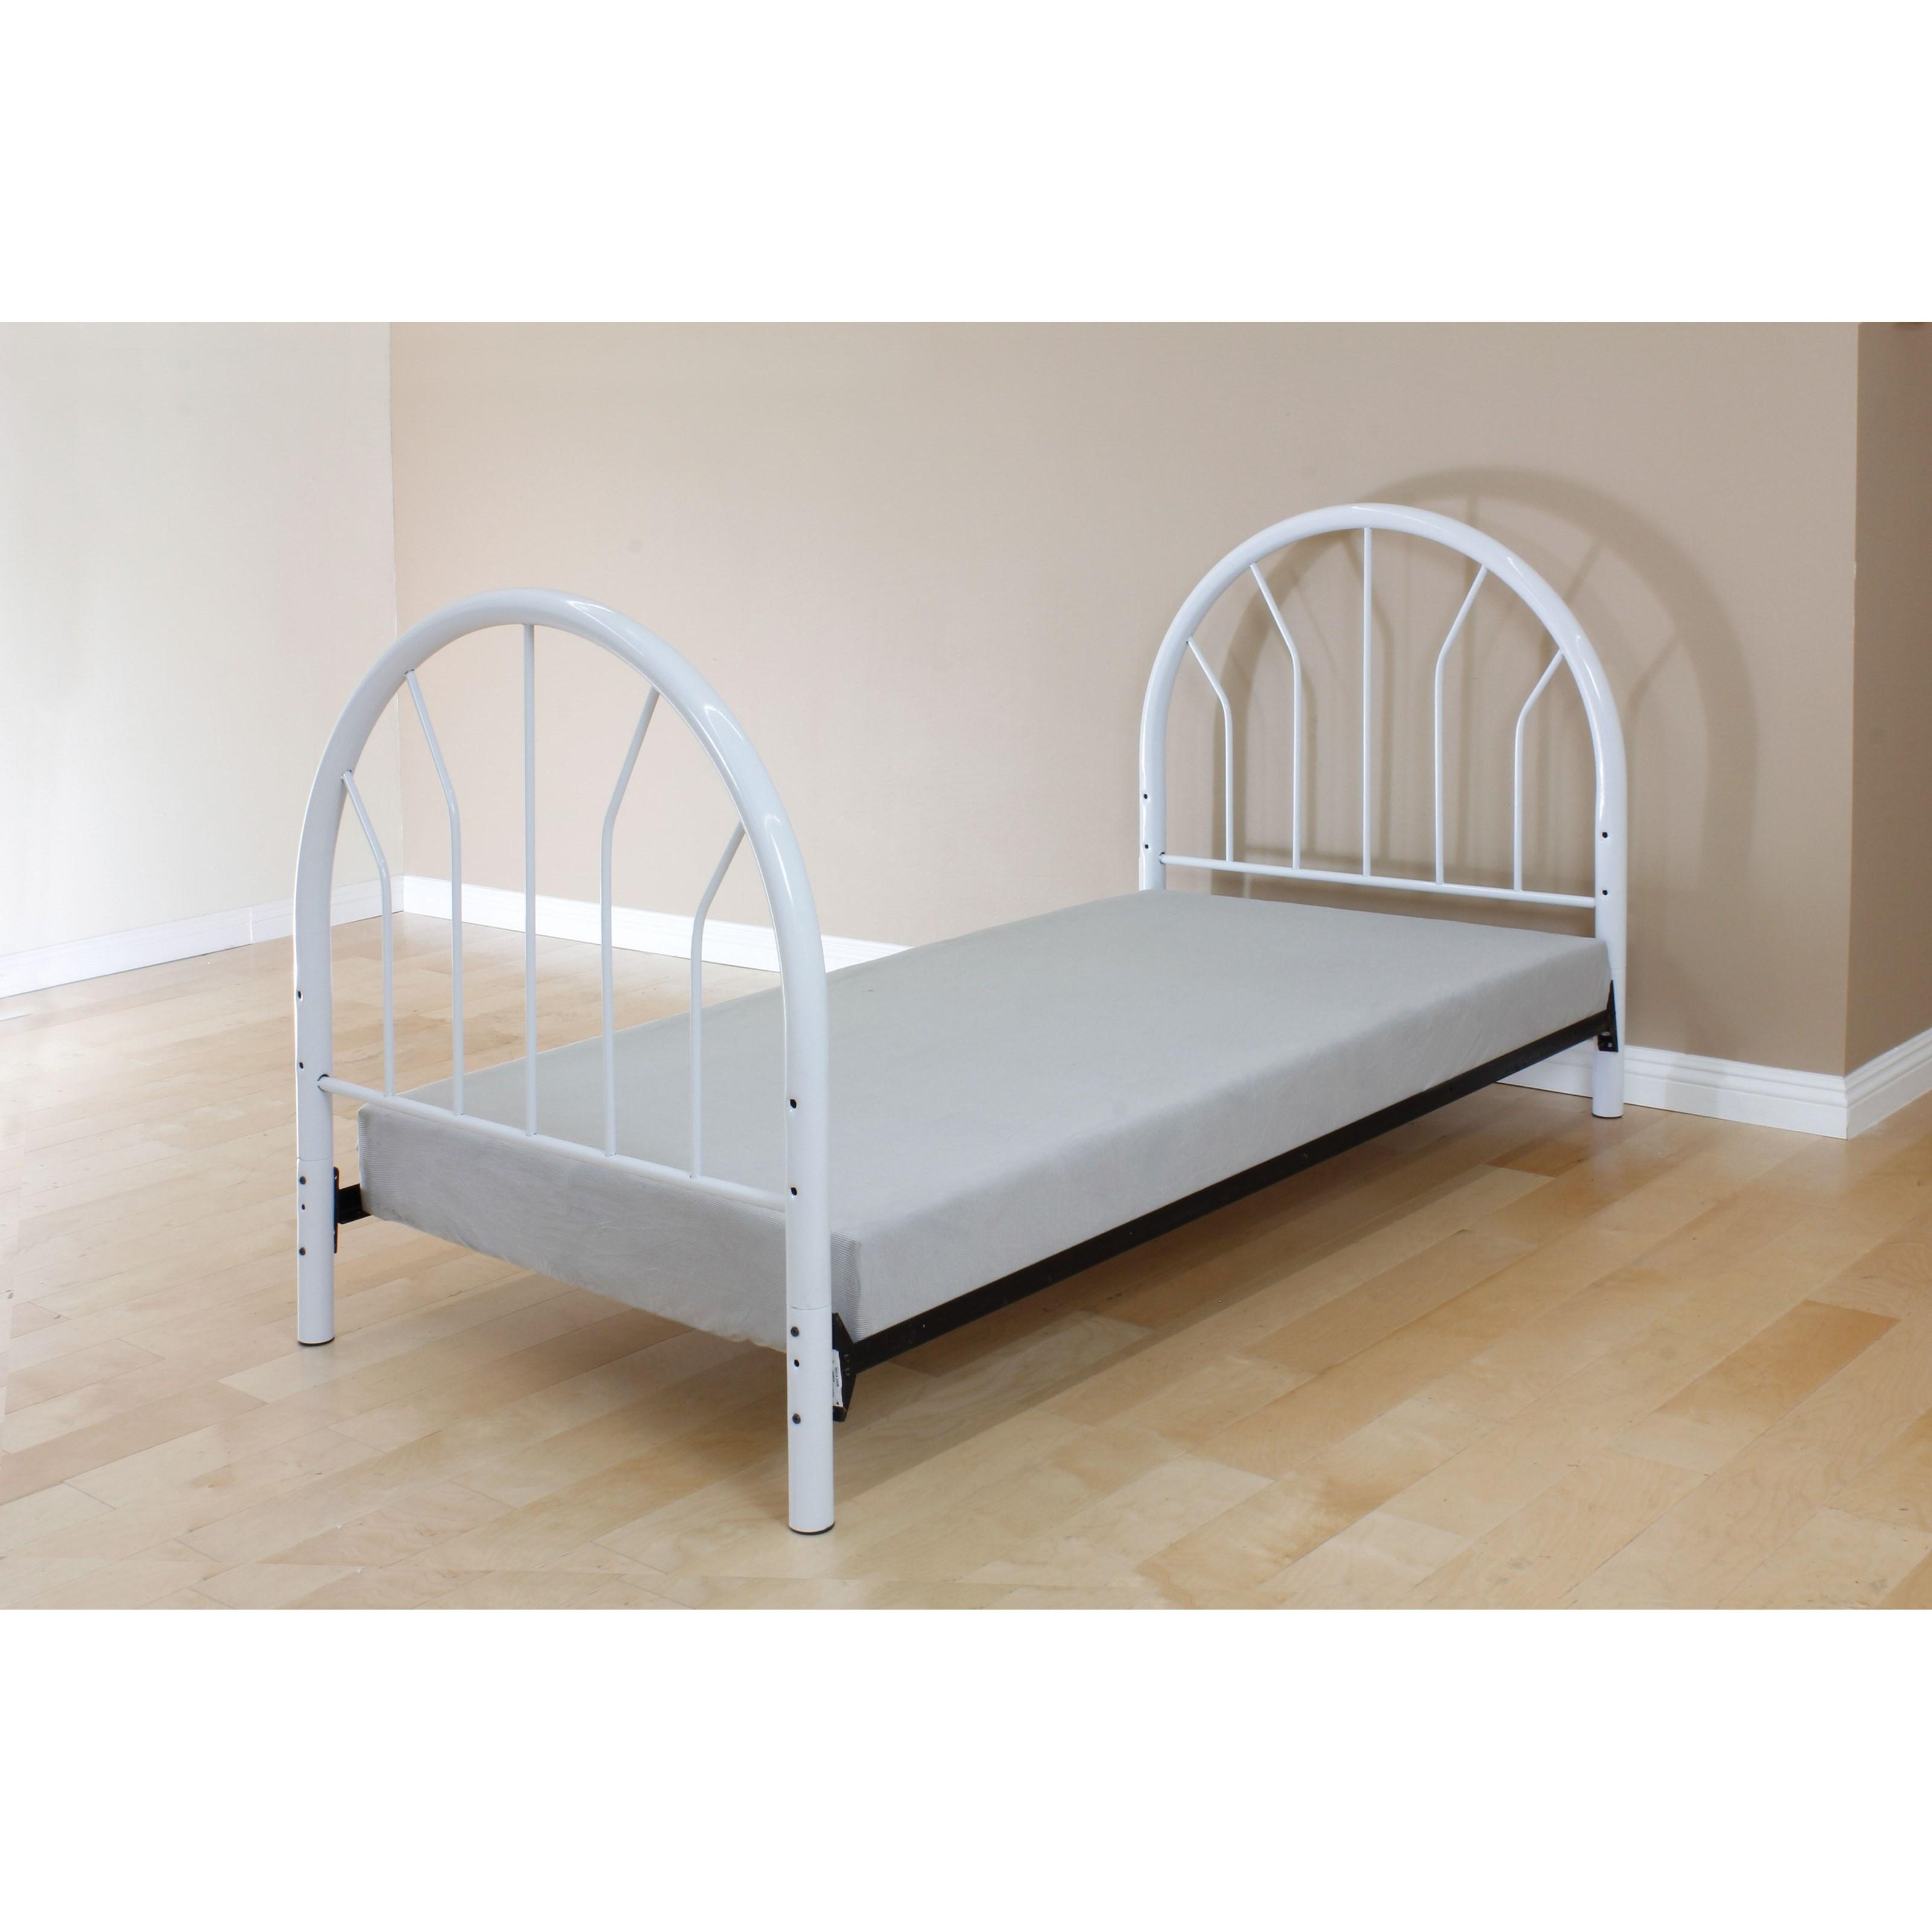 Twin Bed (Headboard/Footboard Only)